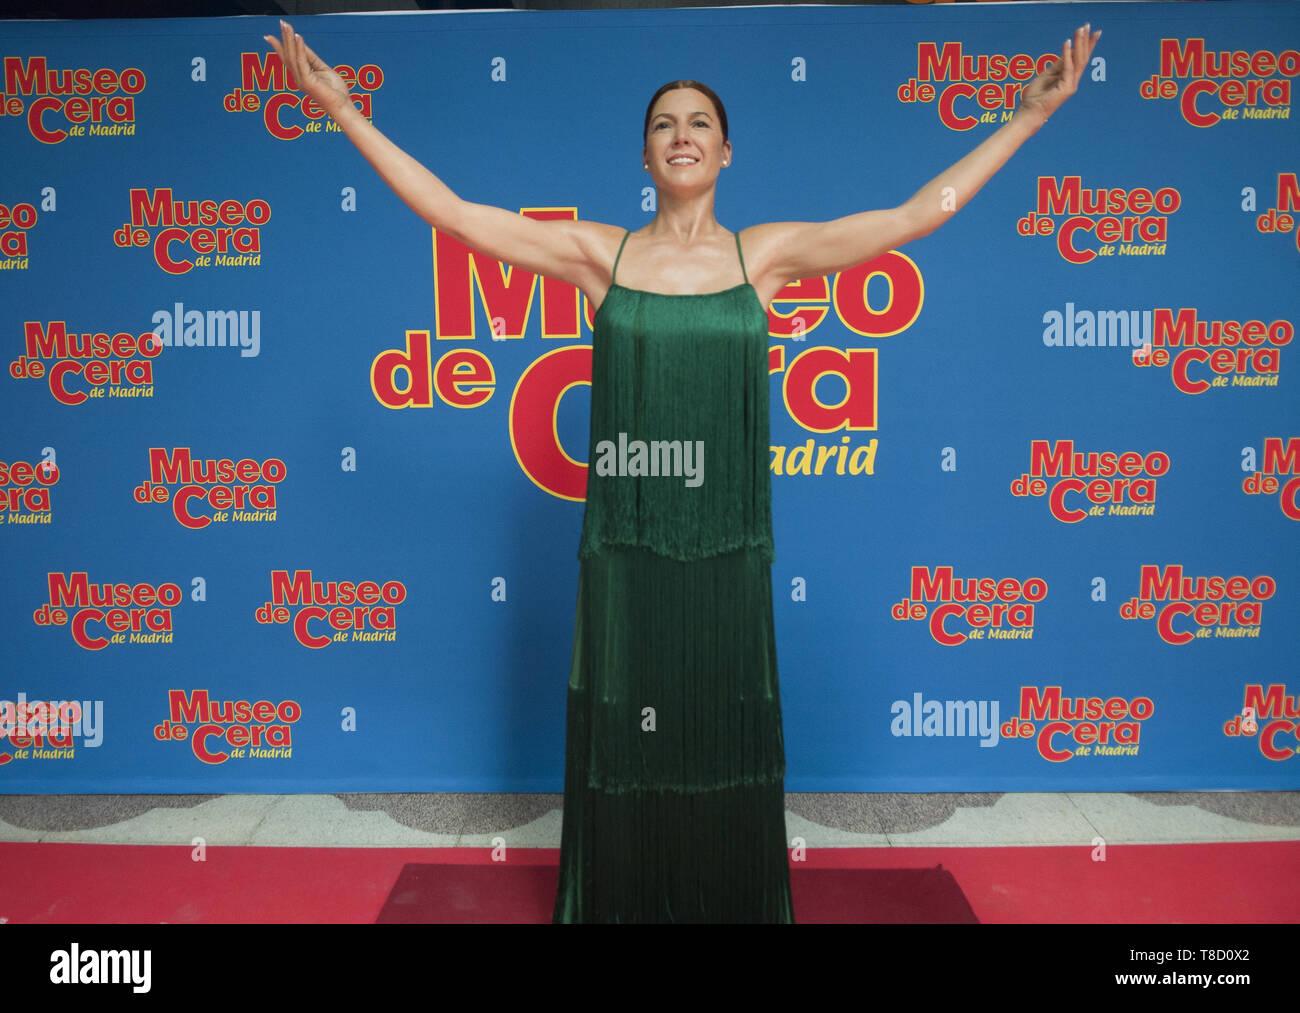 Flamenco dancer Sara Baras inaugurates her wax figure at the Wax Museum of Madrid  Featuring: Sara Baras Where: Madrid, Spain When: 11 Apr 2019 Credit: Oscar Gonzalez/WENN.com - Stock Image